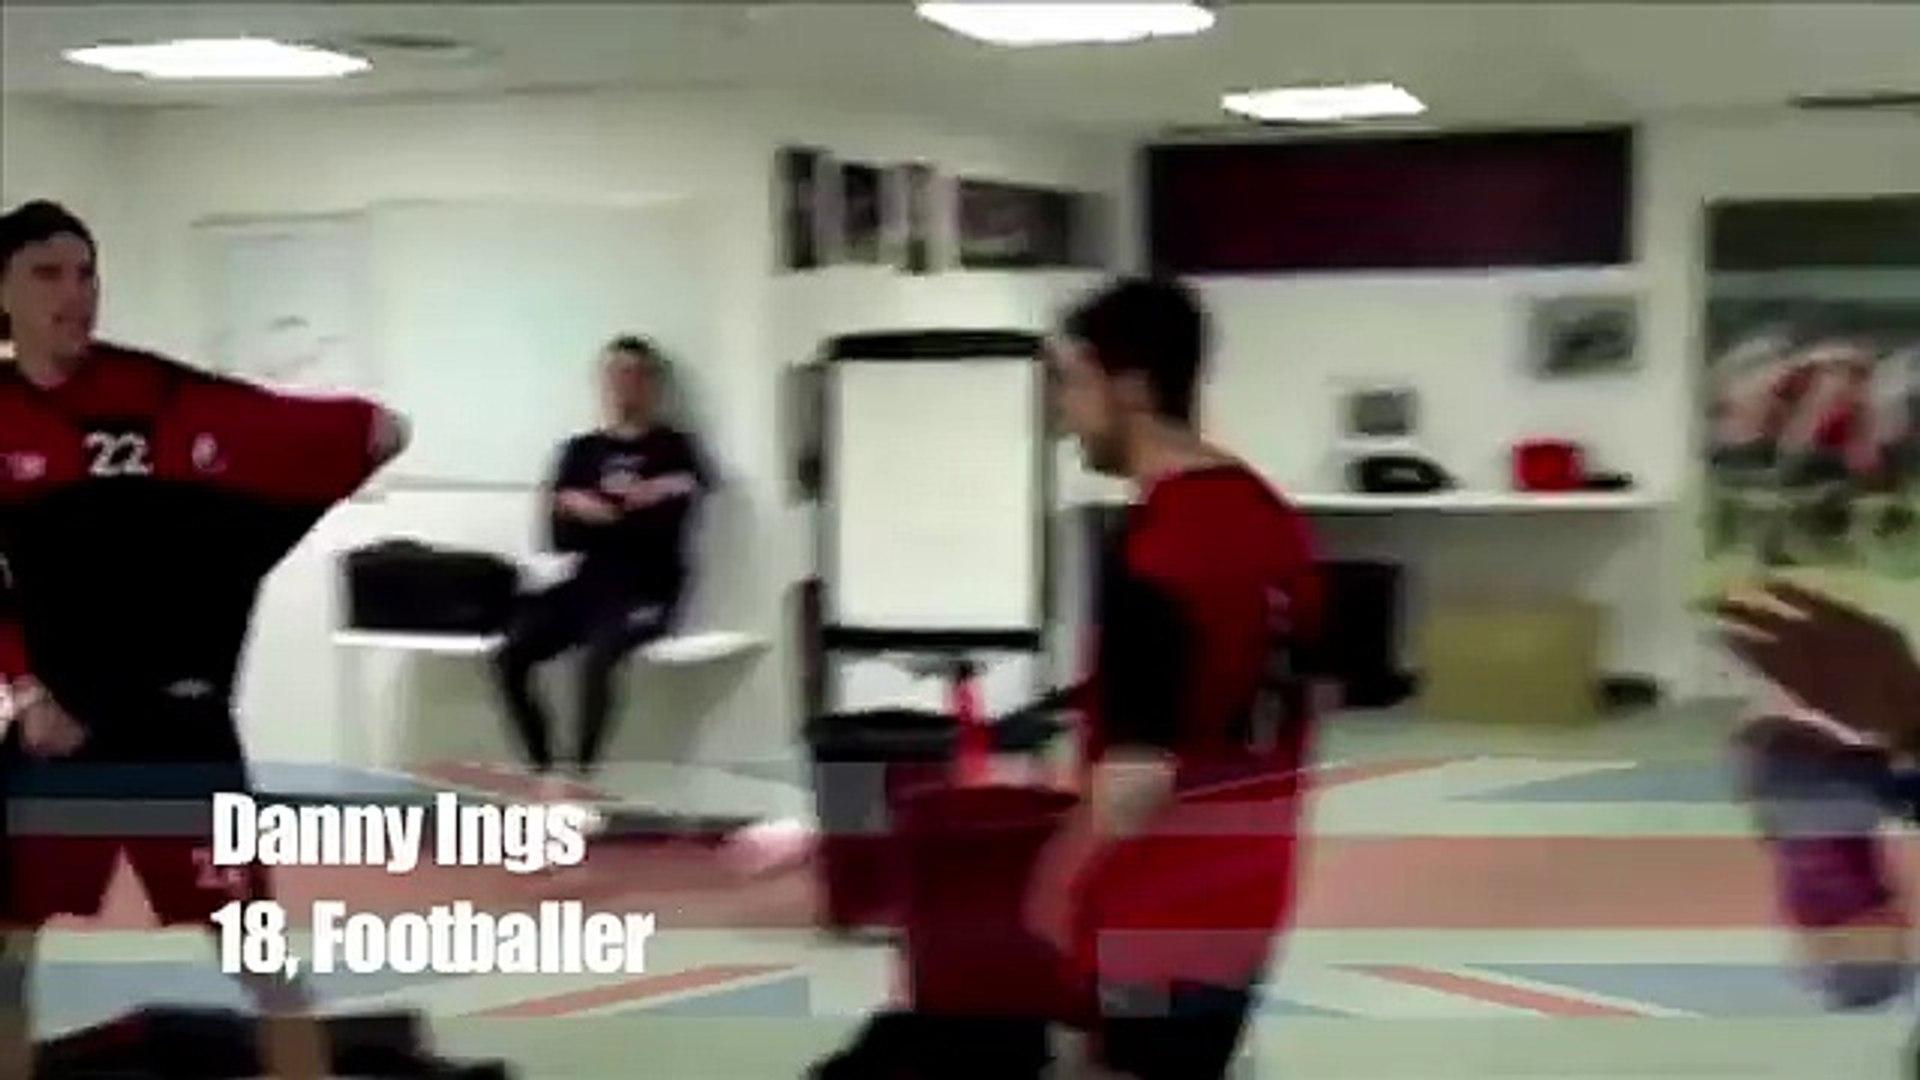 Amazing dance | Current England under 21 international Danny Ings body pops